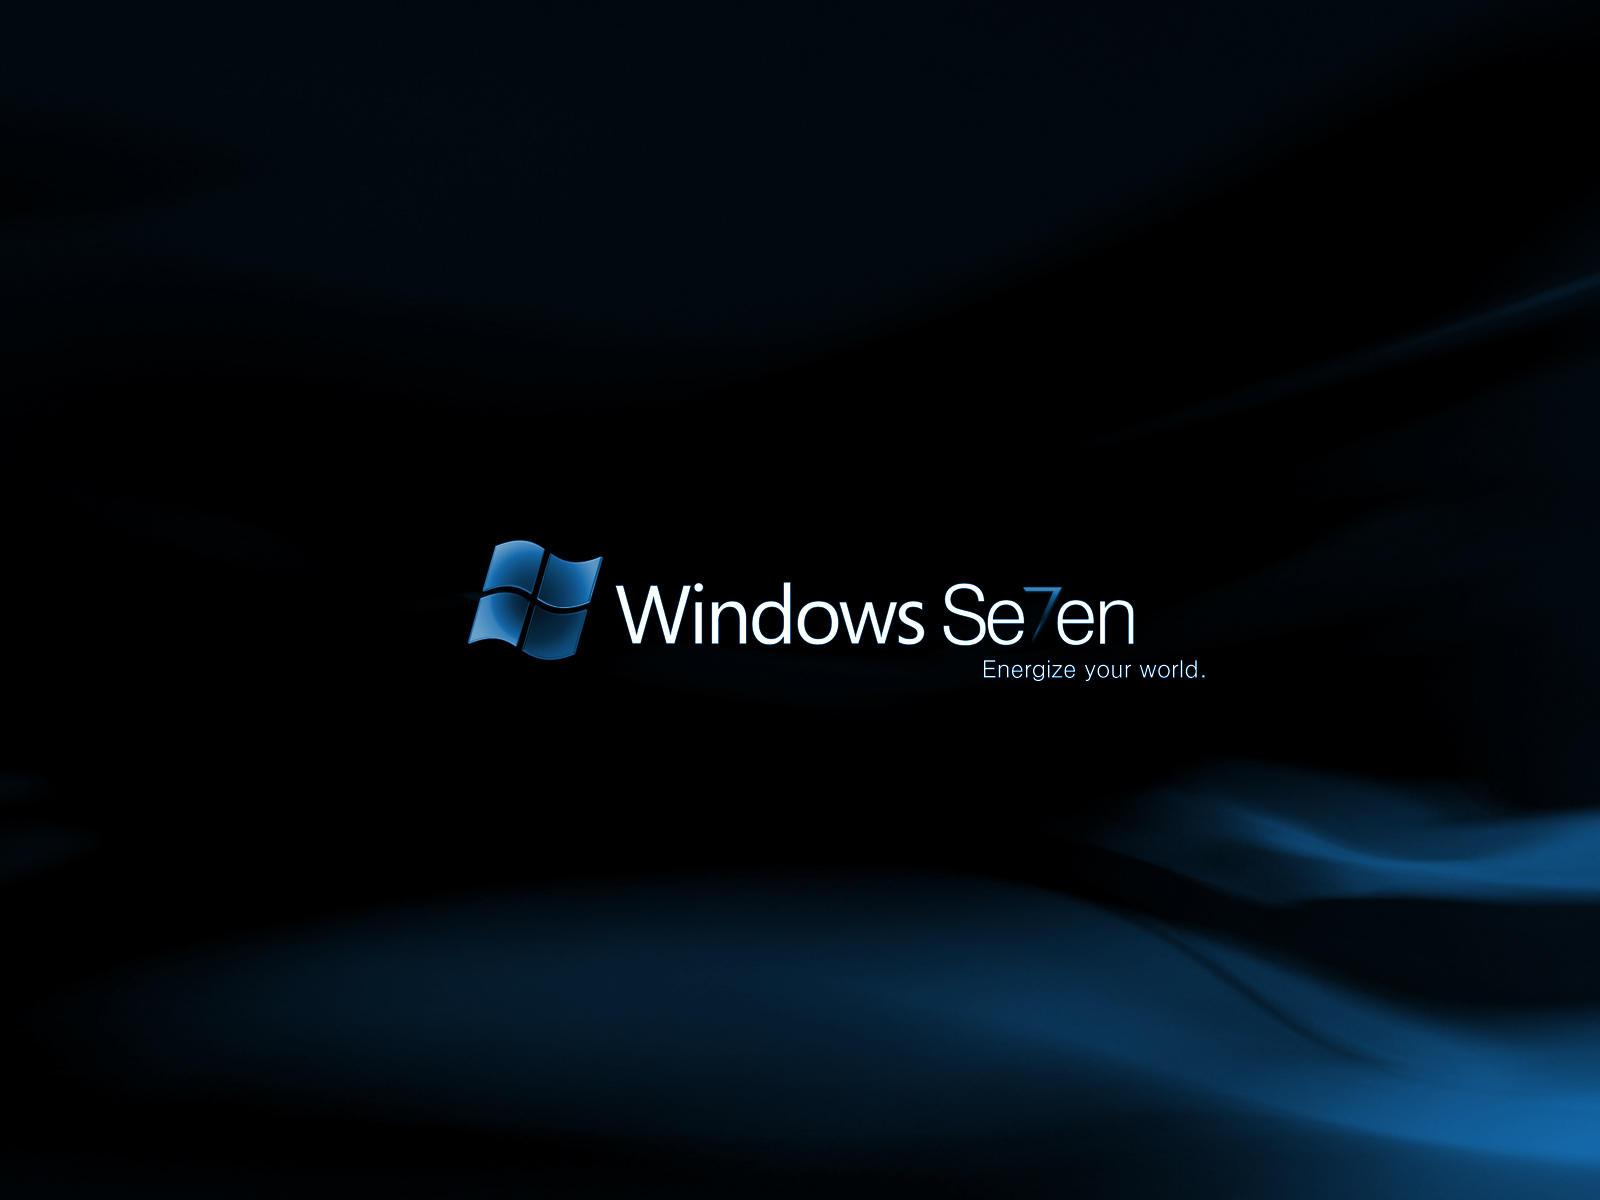 Windows Se7en Midnight by yanomami